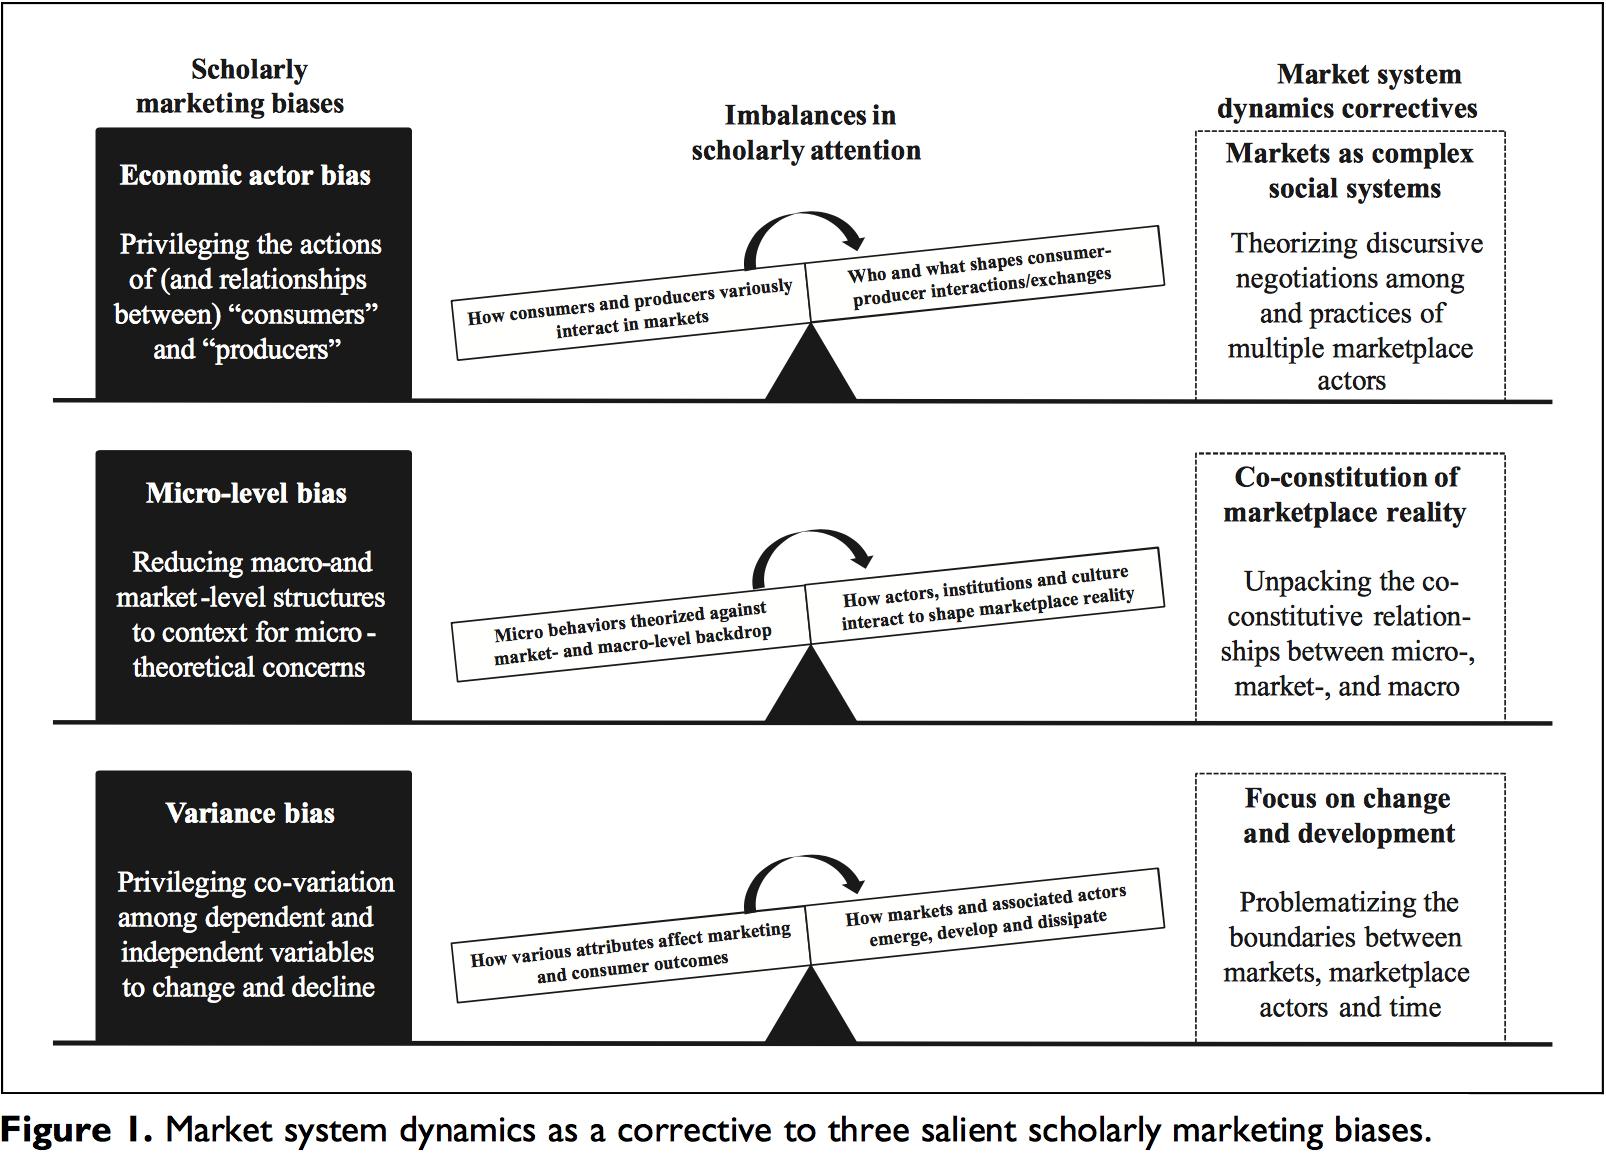 market_system_dynamics_figure.png